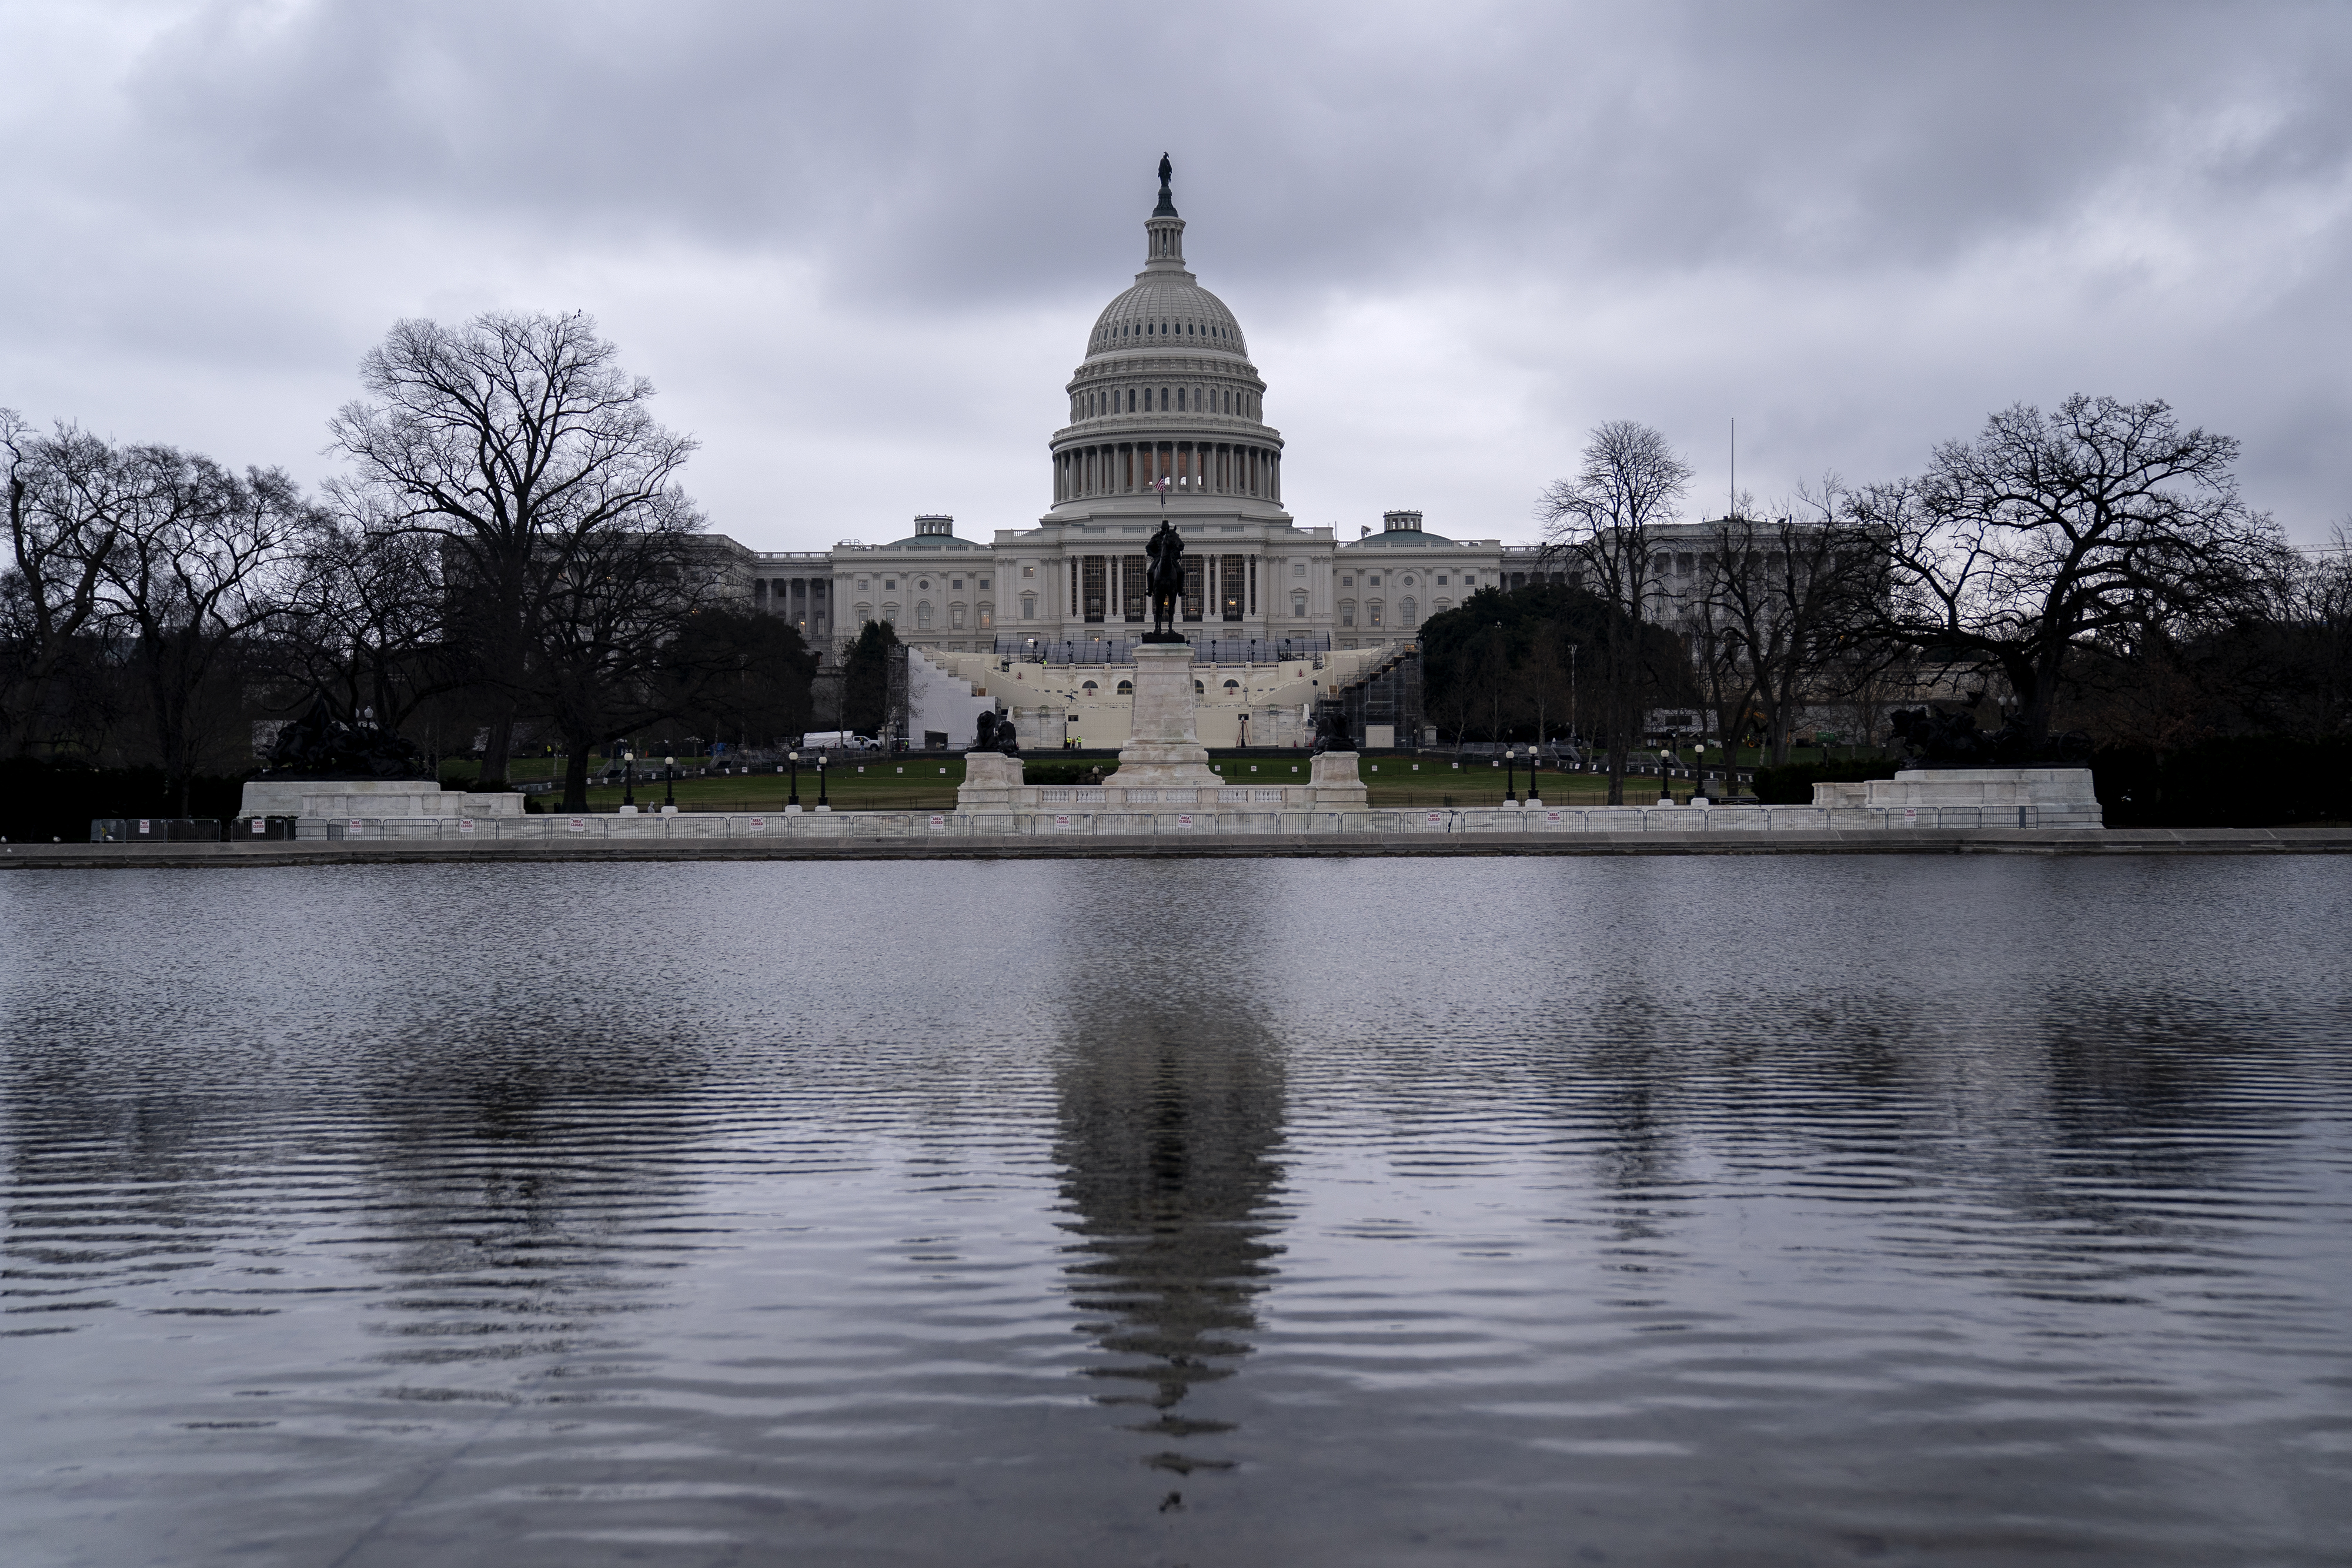 The U.S. Capitol in Washington, D.C., on Jan. 5, 2021.